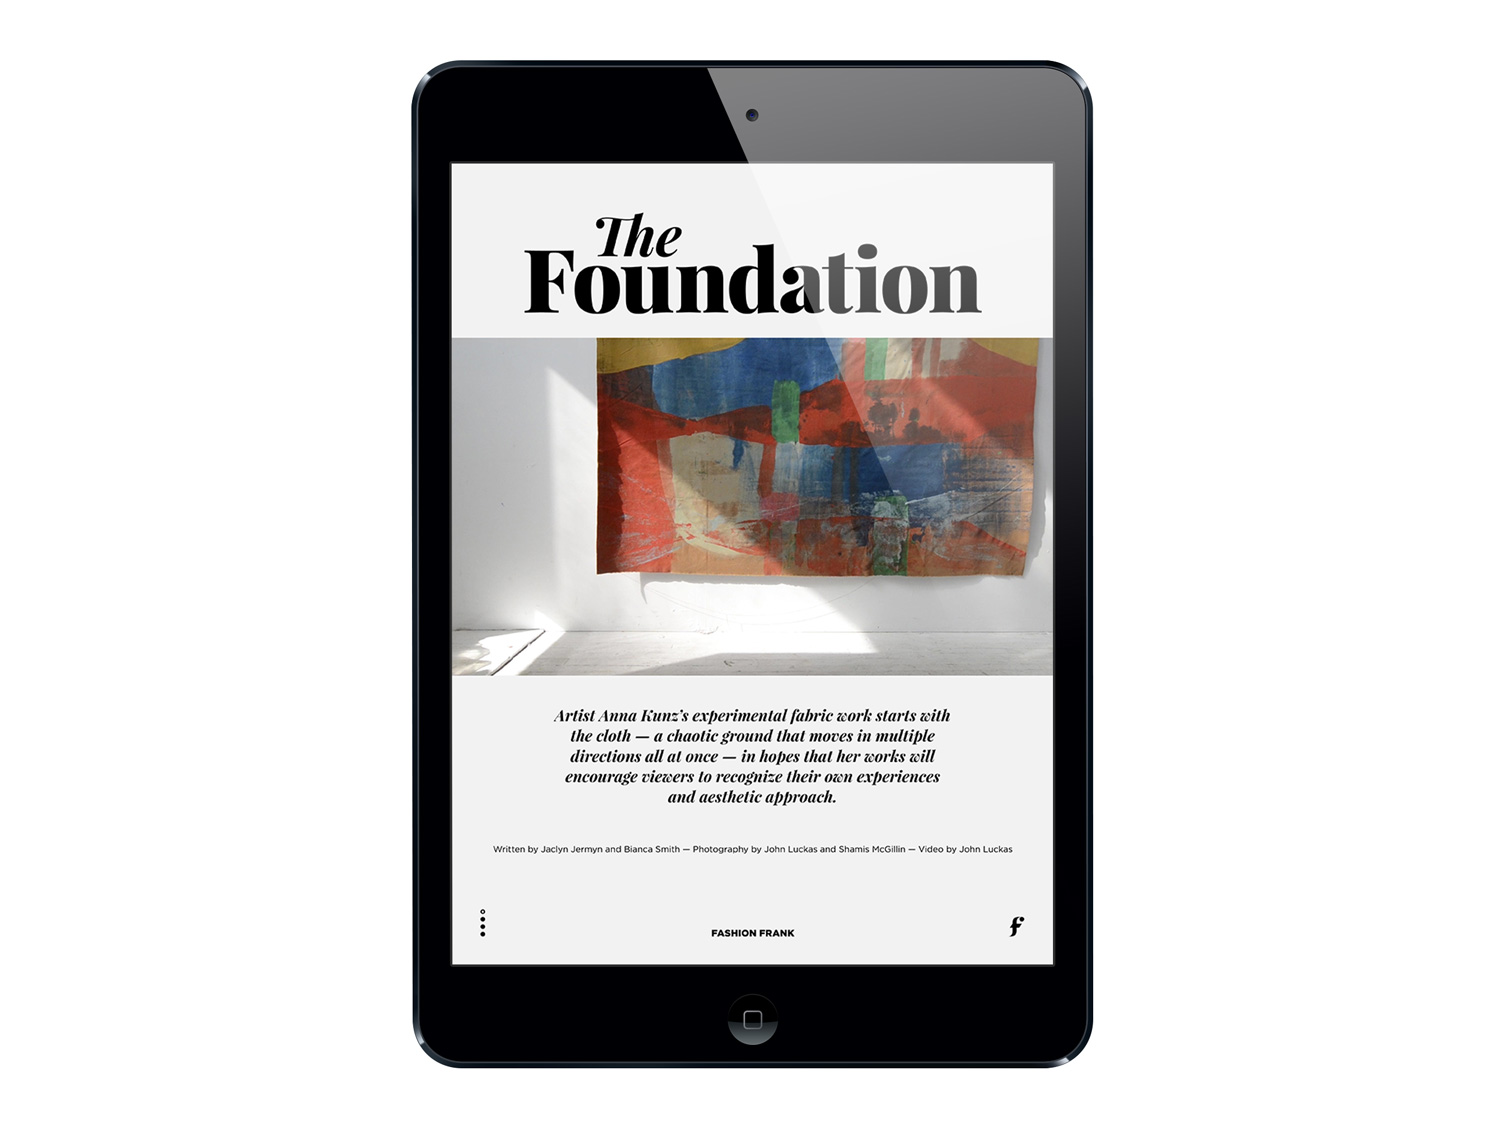 TheFoundation_ipadMockup_1.jpg